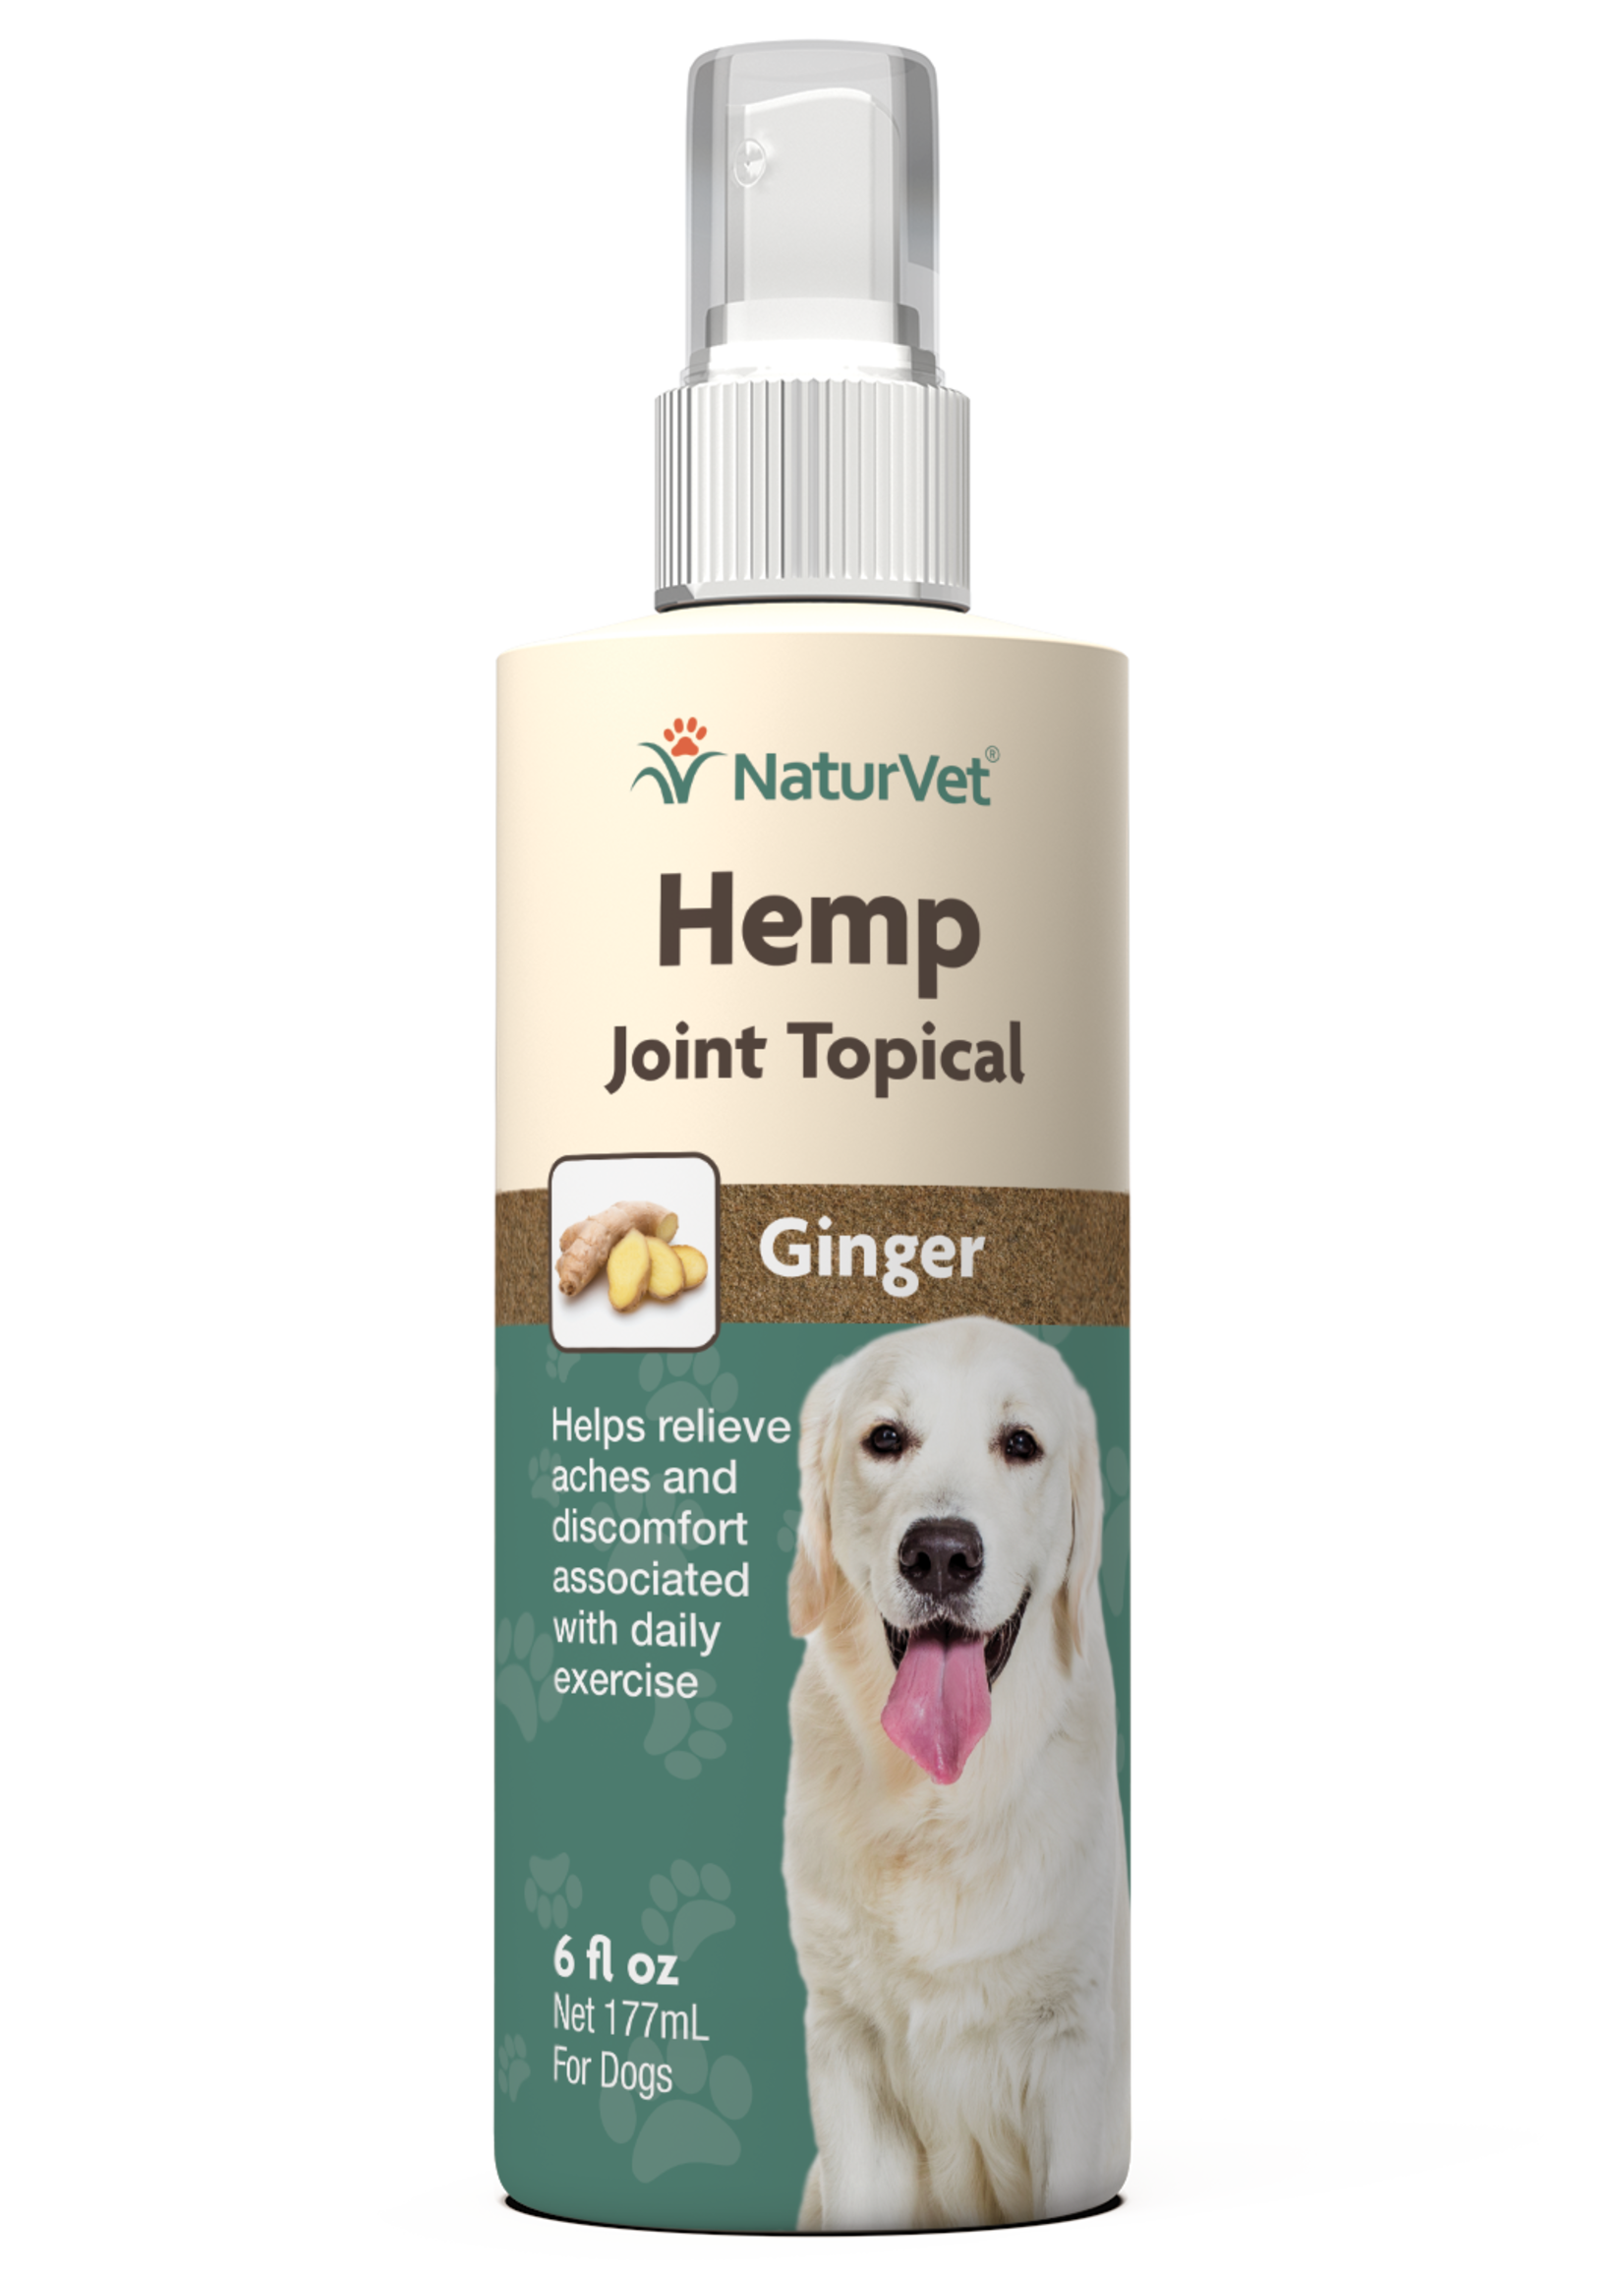 NaturVet NaturVet Dog Hemp Joint Topical Spray 6 oz